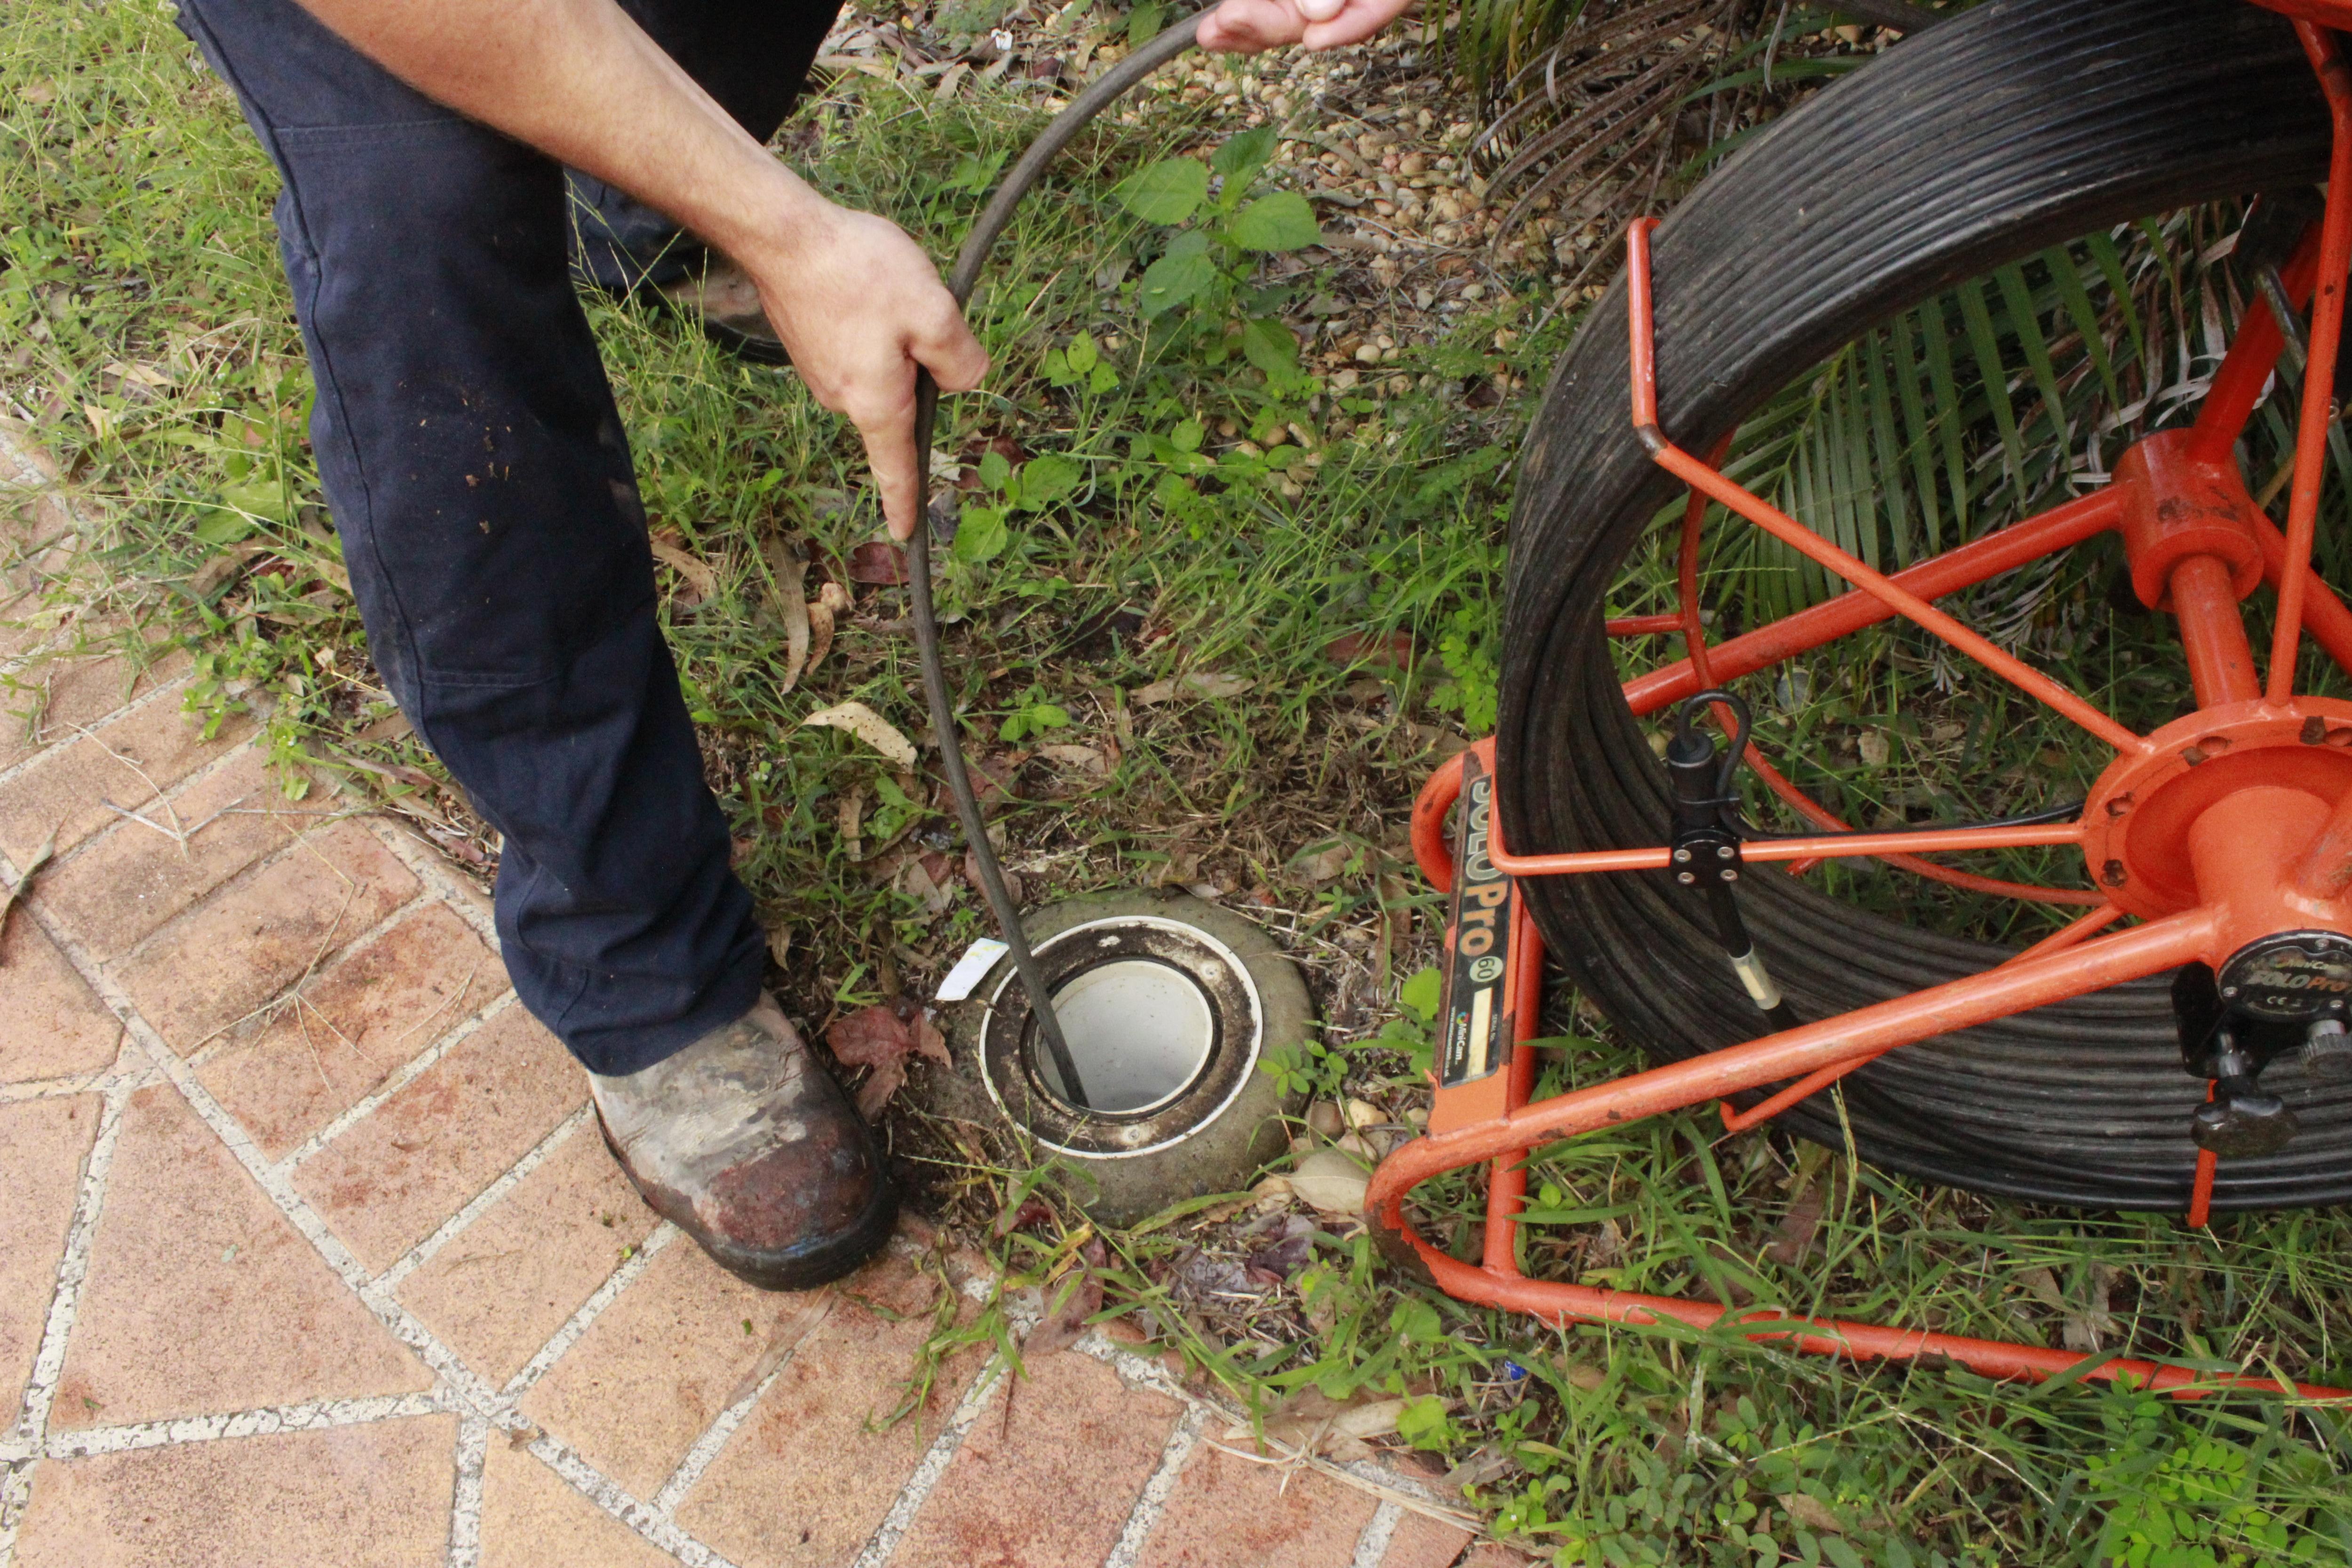 Bcj Plumbing Bcj Plumbing Hot Water Systems Shed 1 27